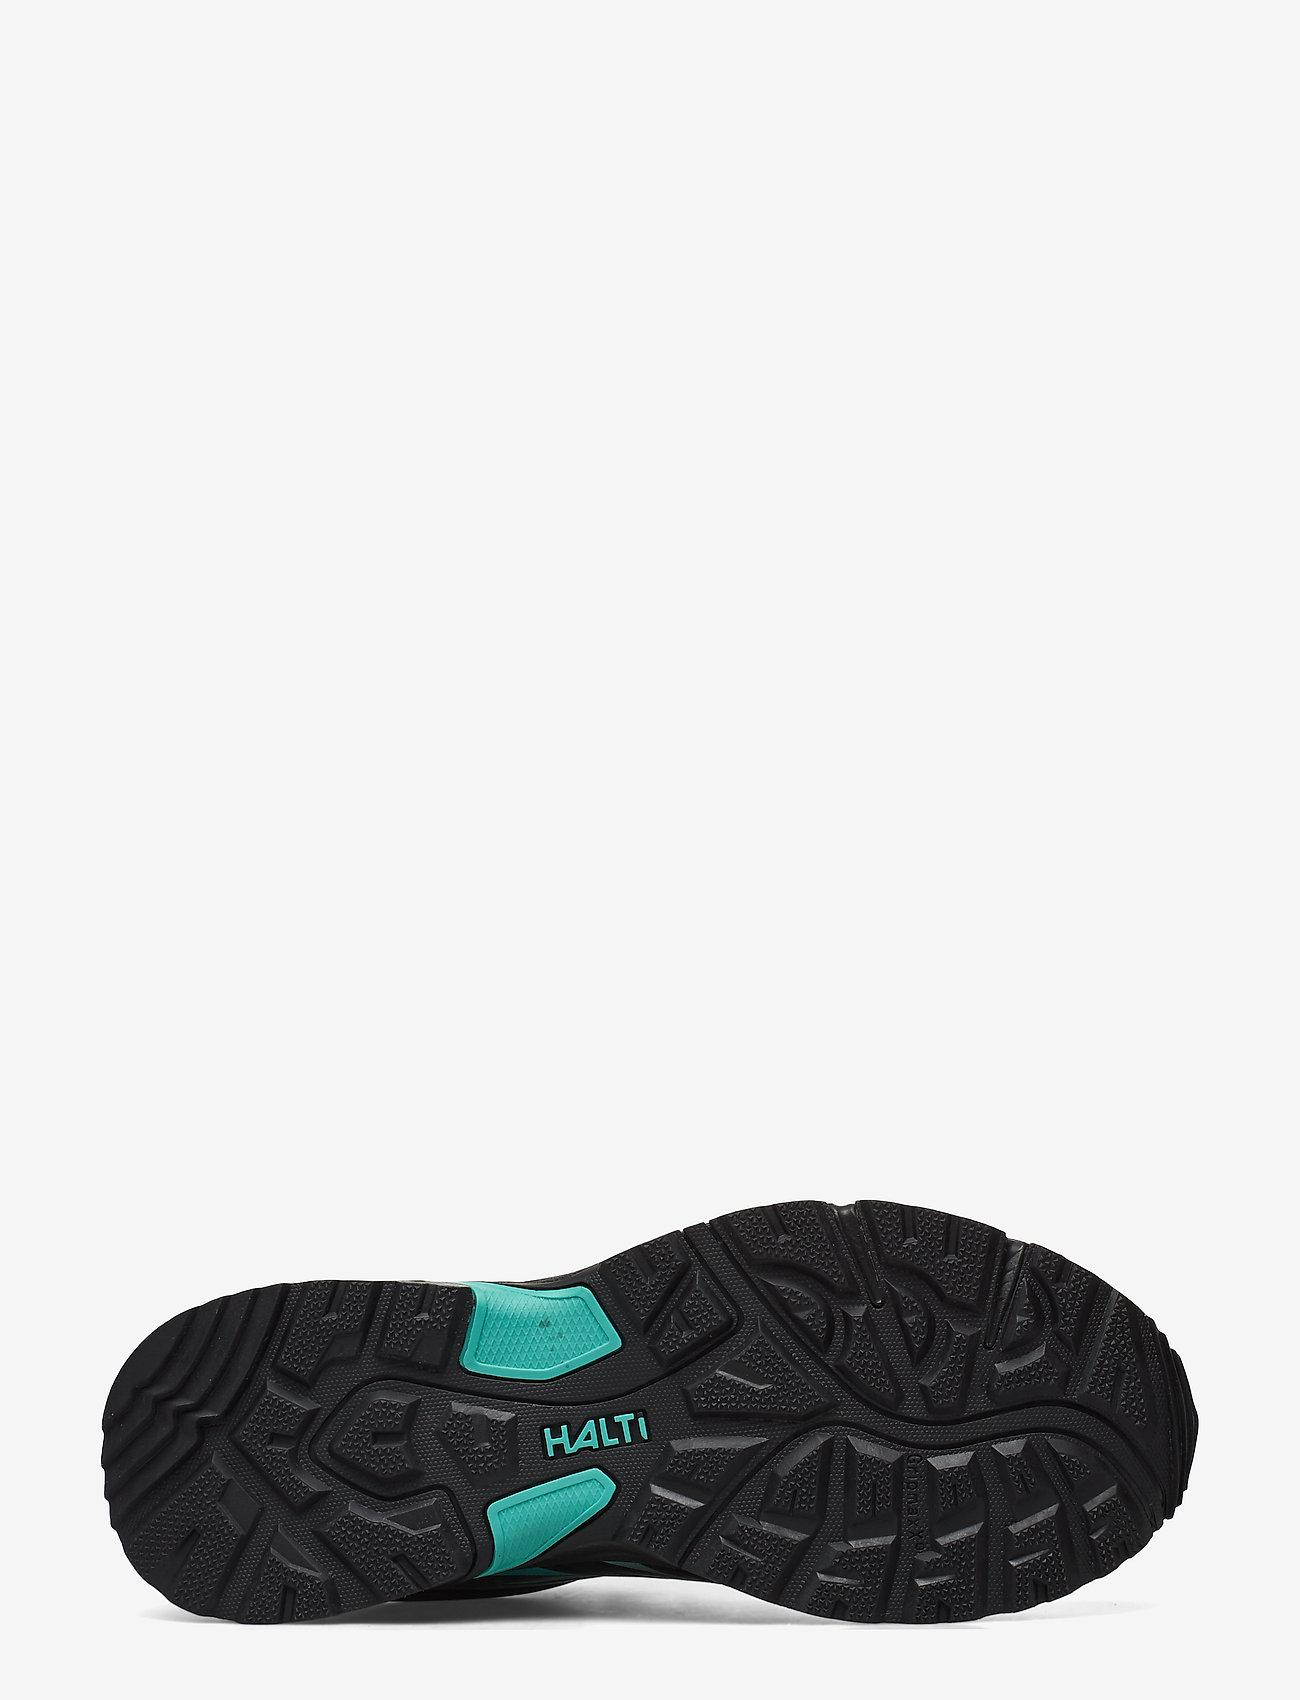 Narvik Women's Low Drymaxx Outdoor Shoes (Ceramic Mint) - Halti